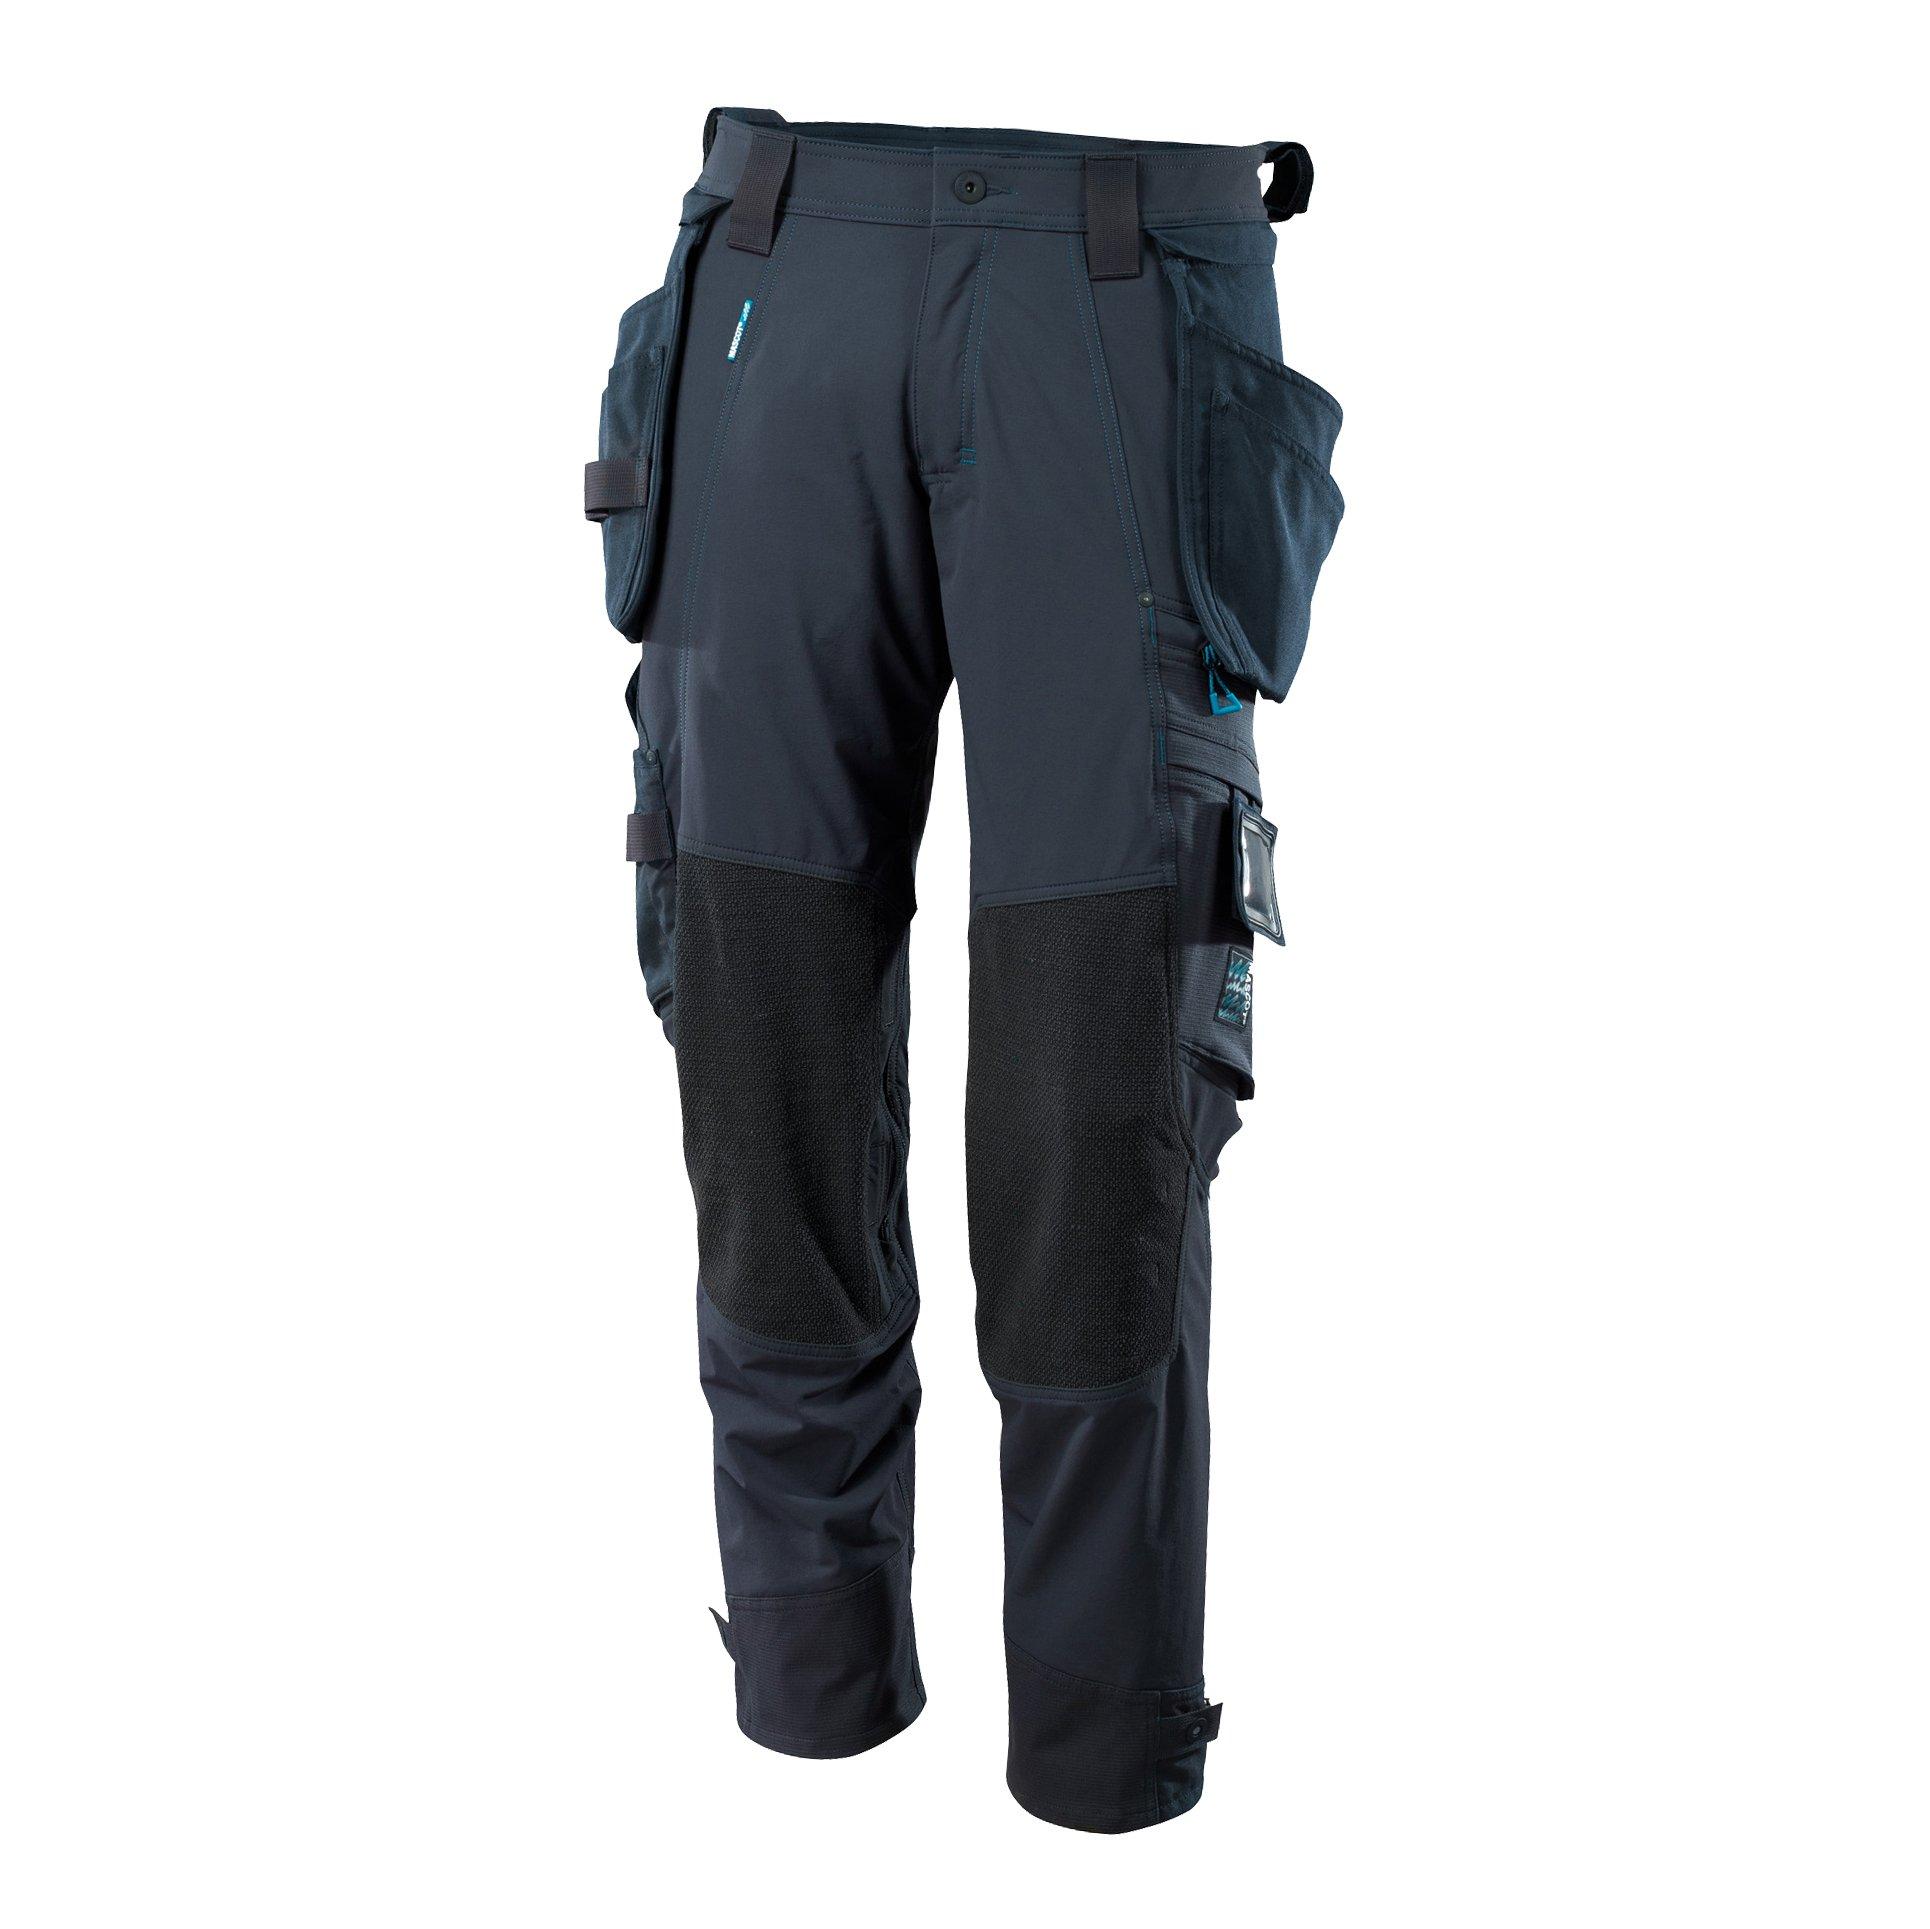 Mascot 17031-311-010-82C68 Trousers Safety Pants, Black/Blue, 82C68